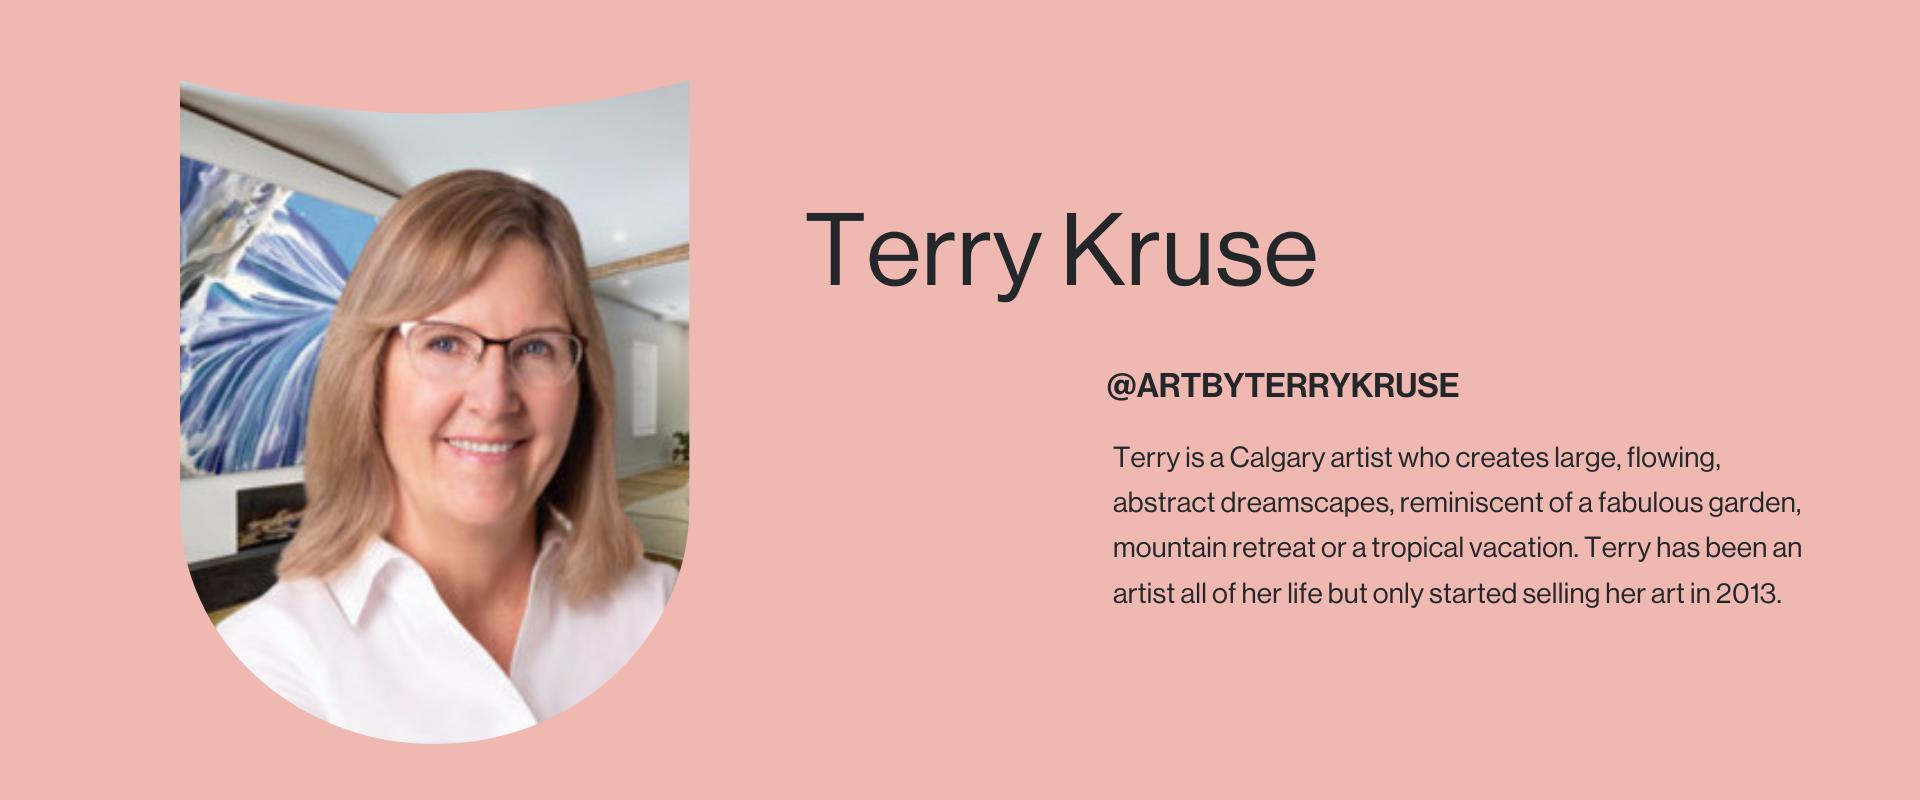 Artist Terry Kruse bio